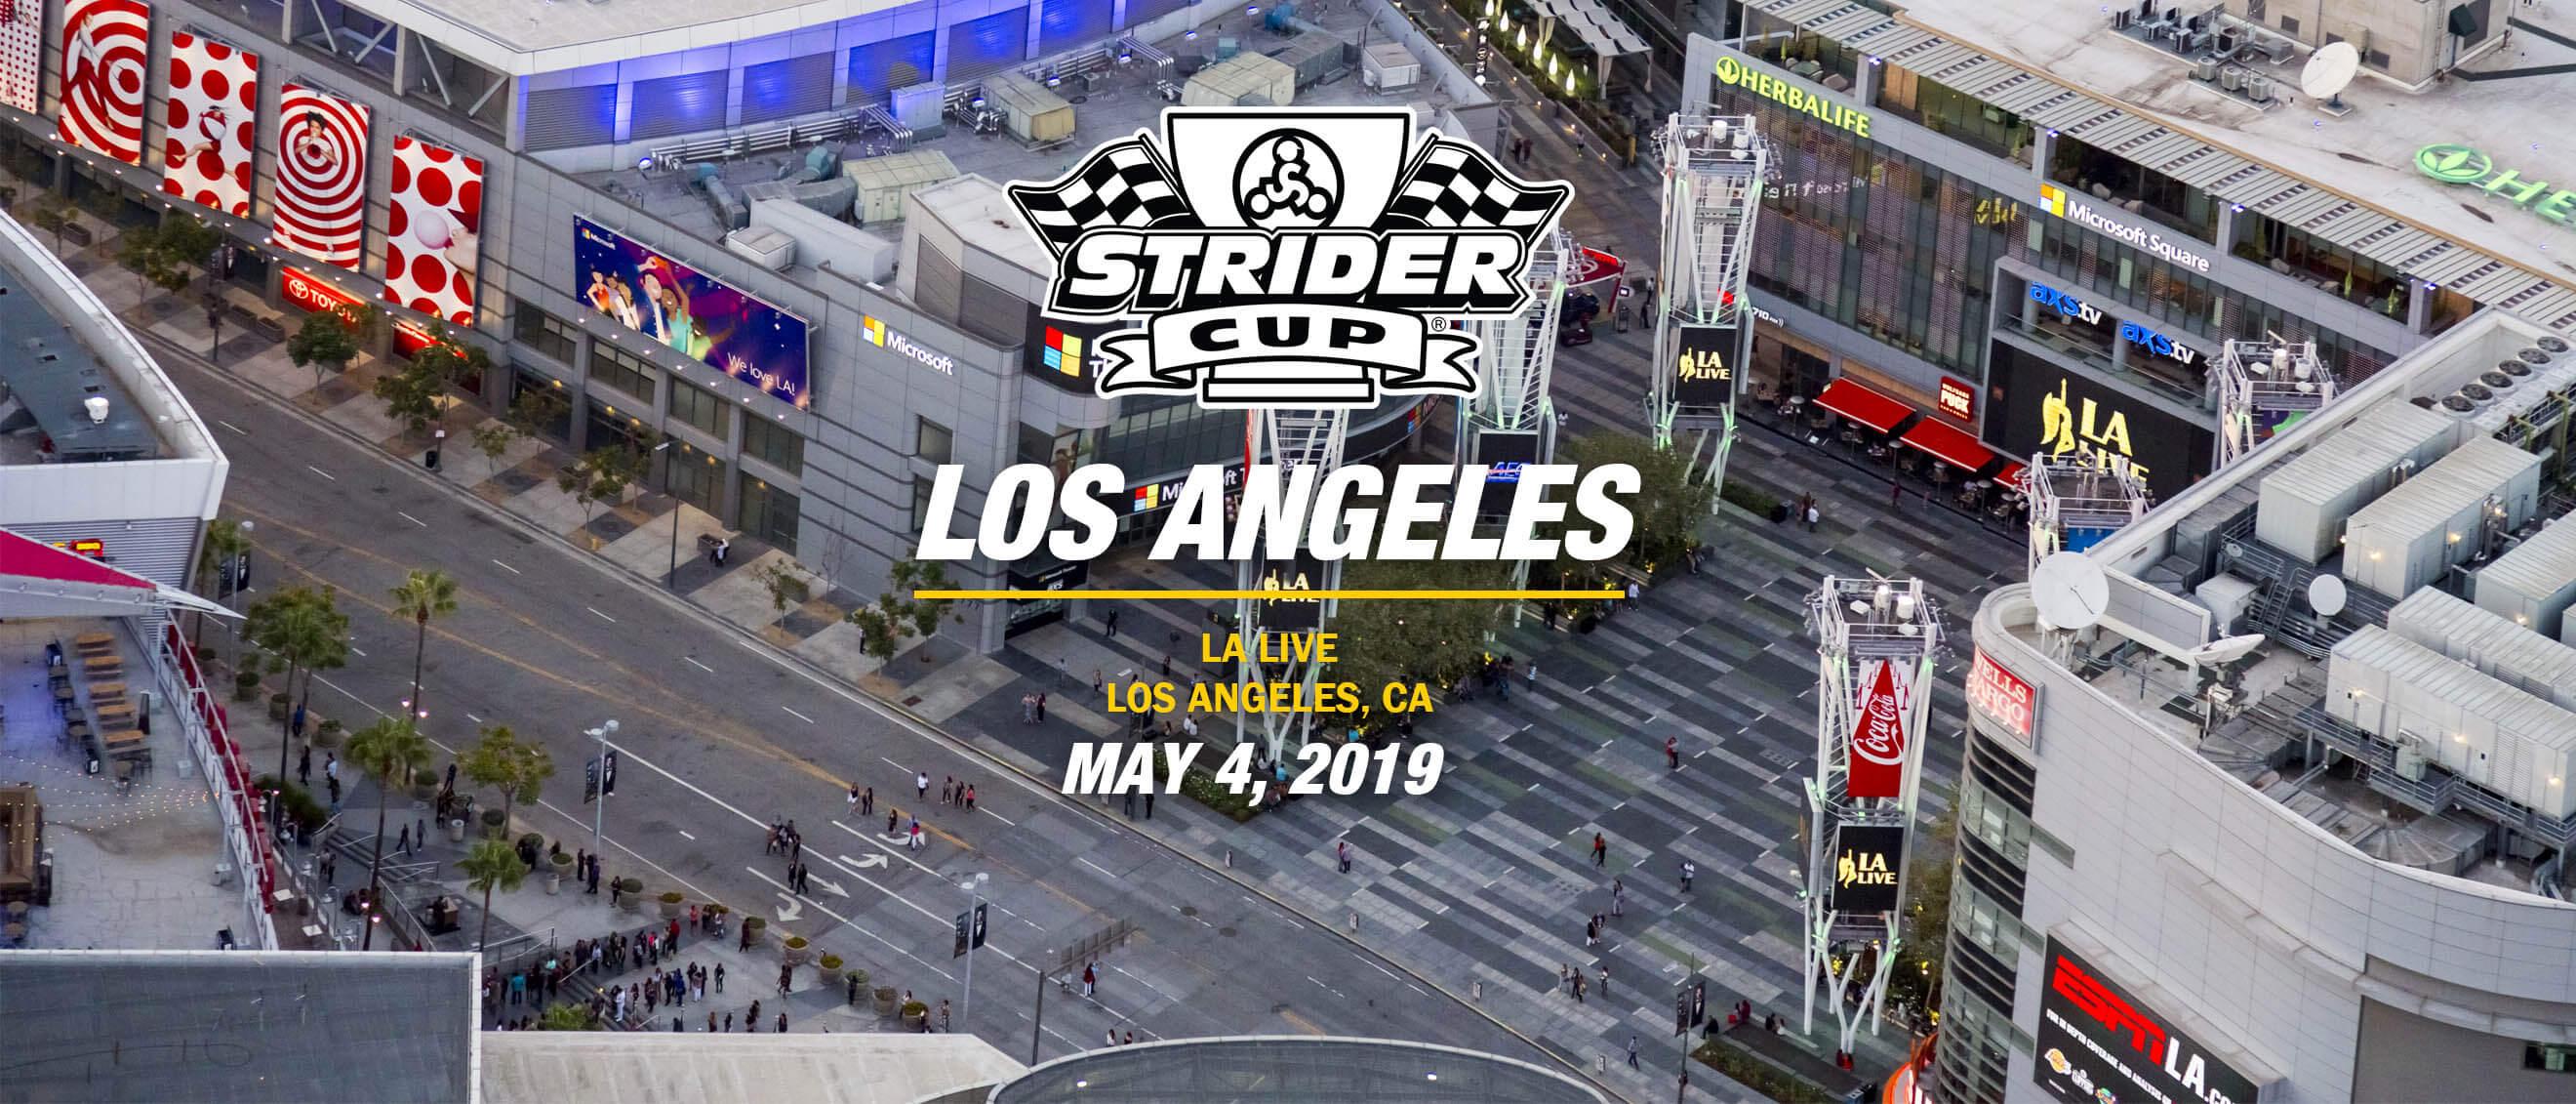 , Events – Los Angeles, Strider Balance Bikes